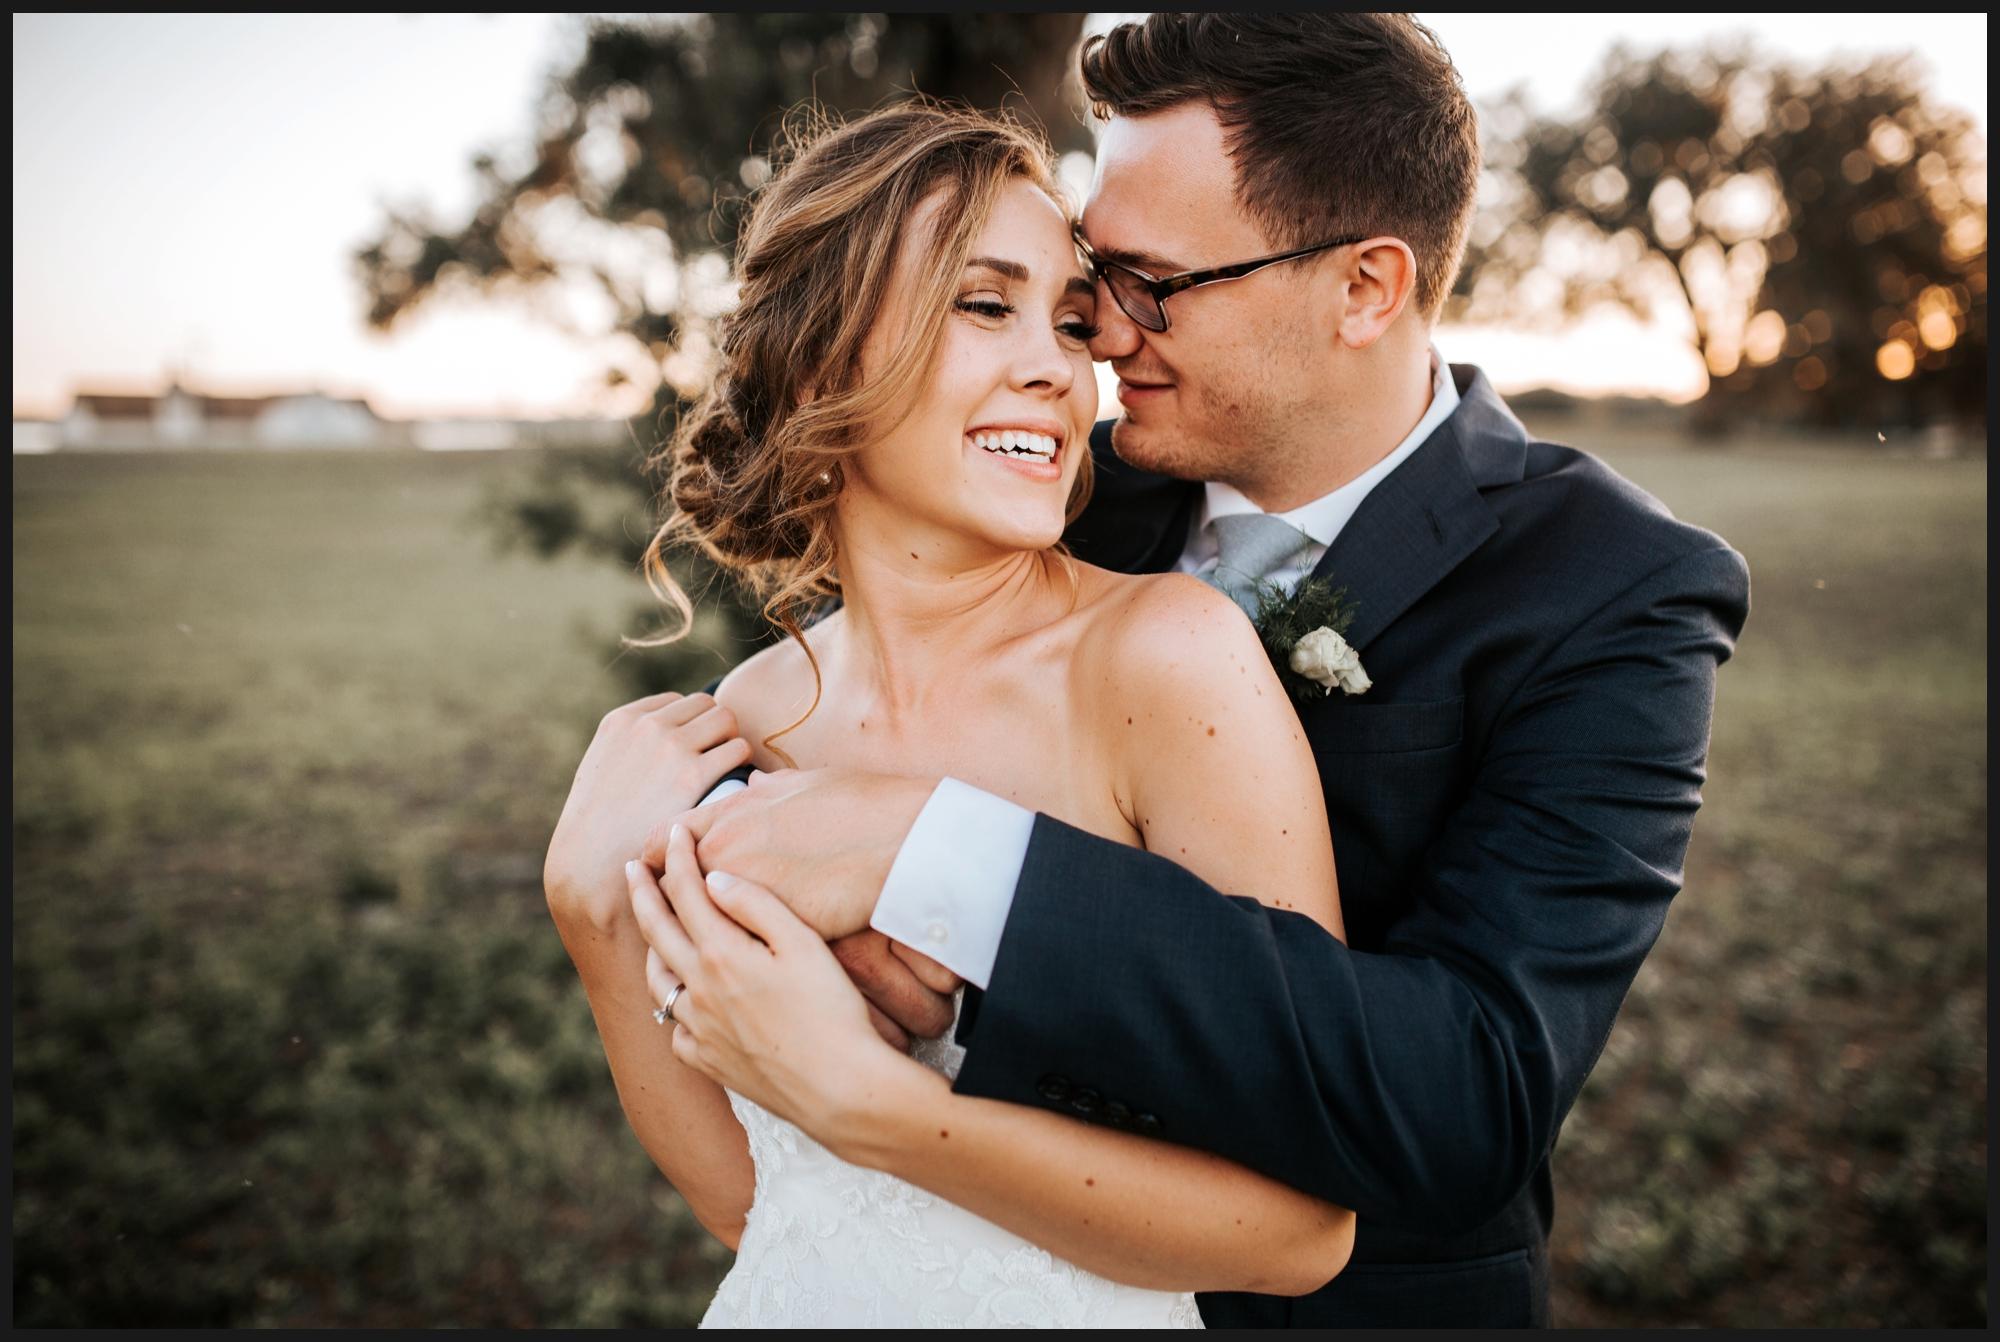 Orlando-Wedding-Photographer-destination-wedding-photographer-florida-wedding-photographer-bohemian-wedding-photographer_0112.jpg